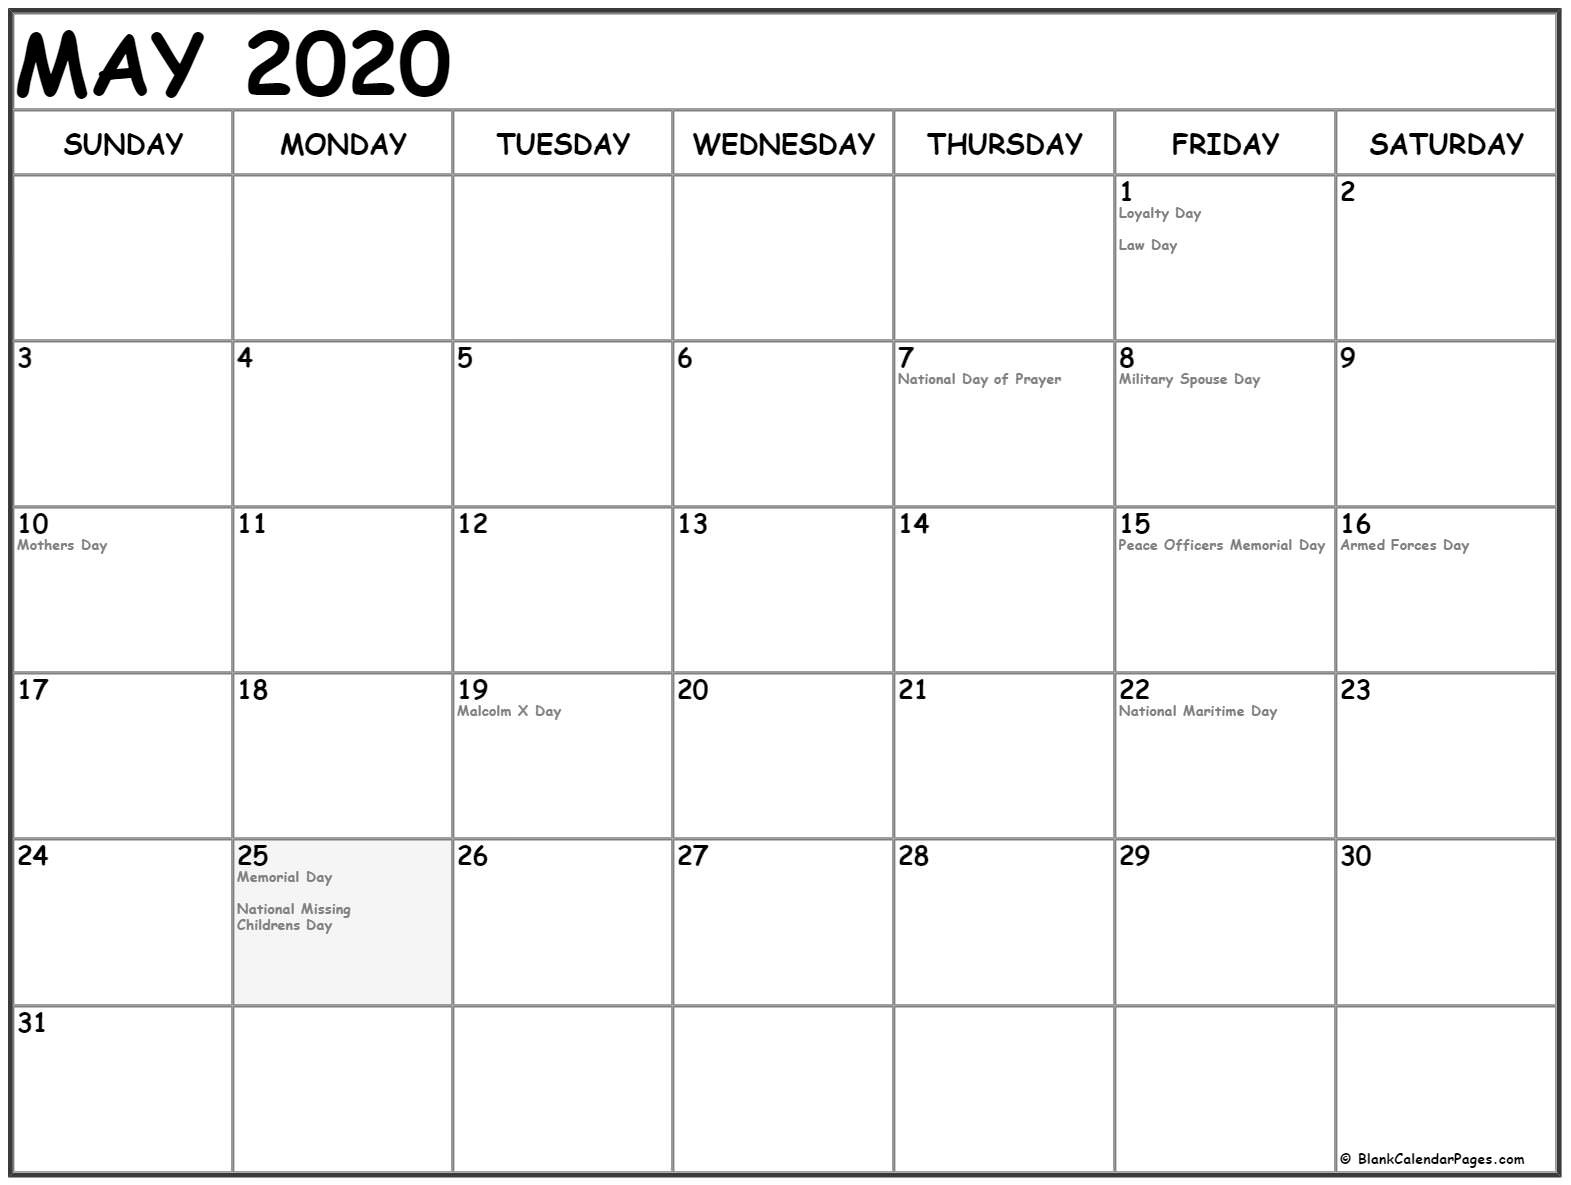 May Calendar Archives » Creative Calendar Ideas regarding Kalnirnay 2020 Holidays